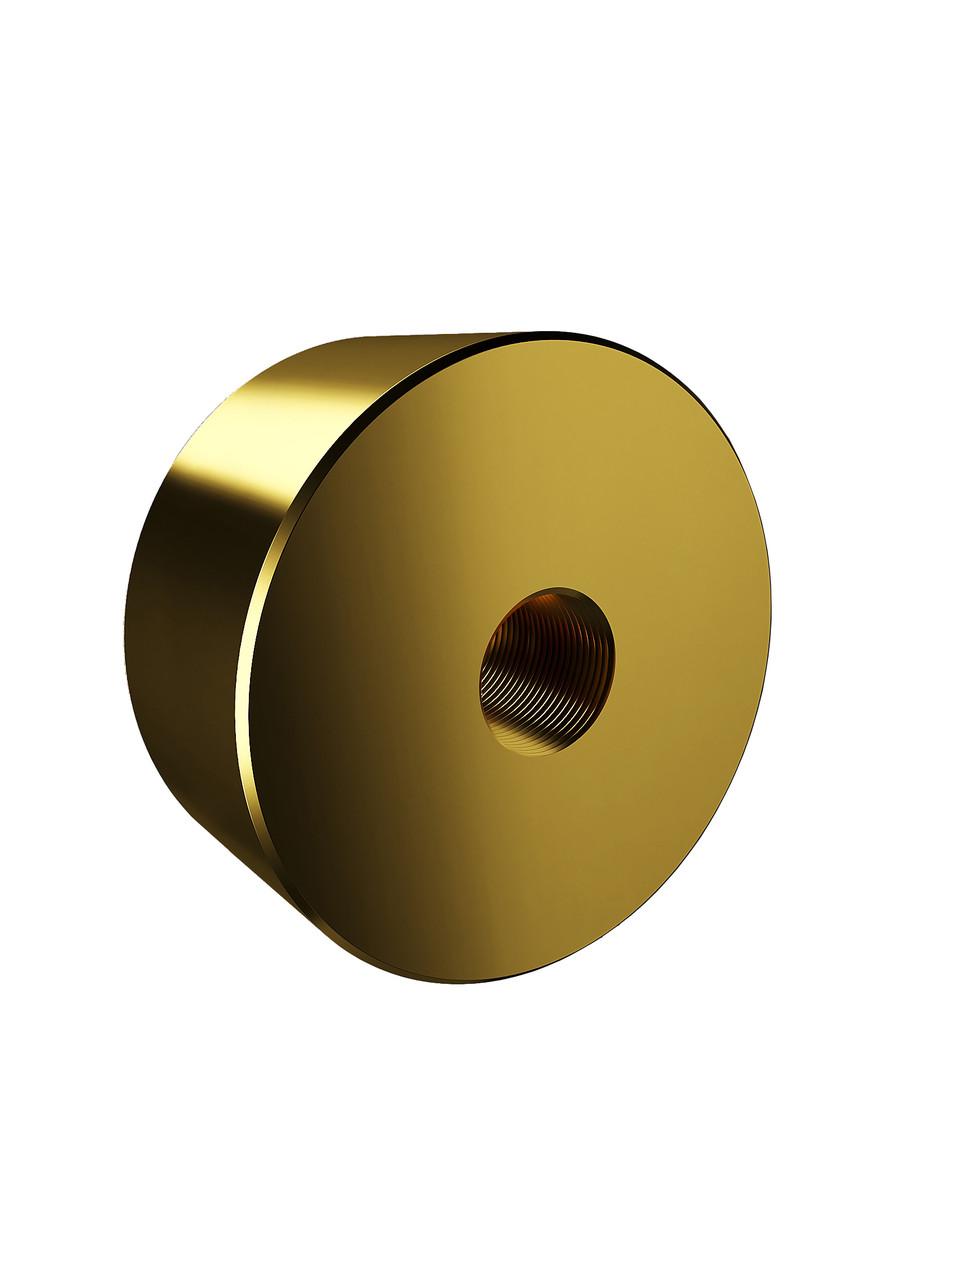 ODF-06-26-10-L20 Дистанция 20 мм для коннектора диаметром 40 мм и с резьбой М10, цвет золото